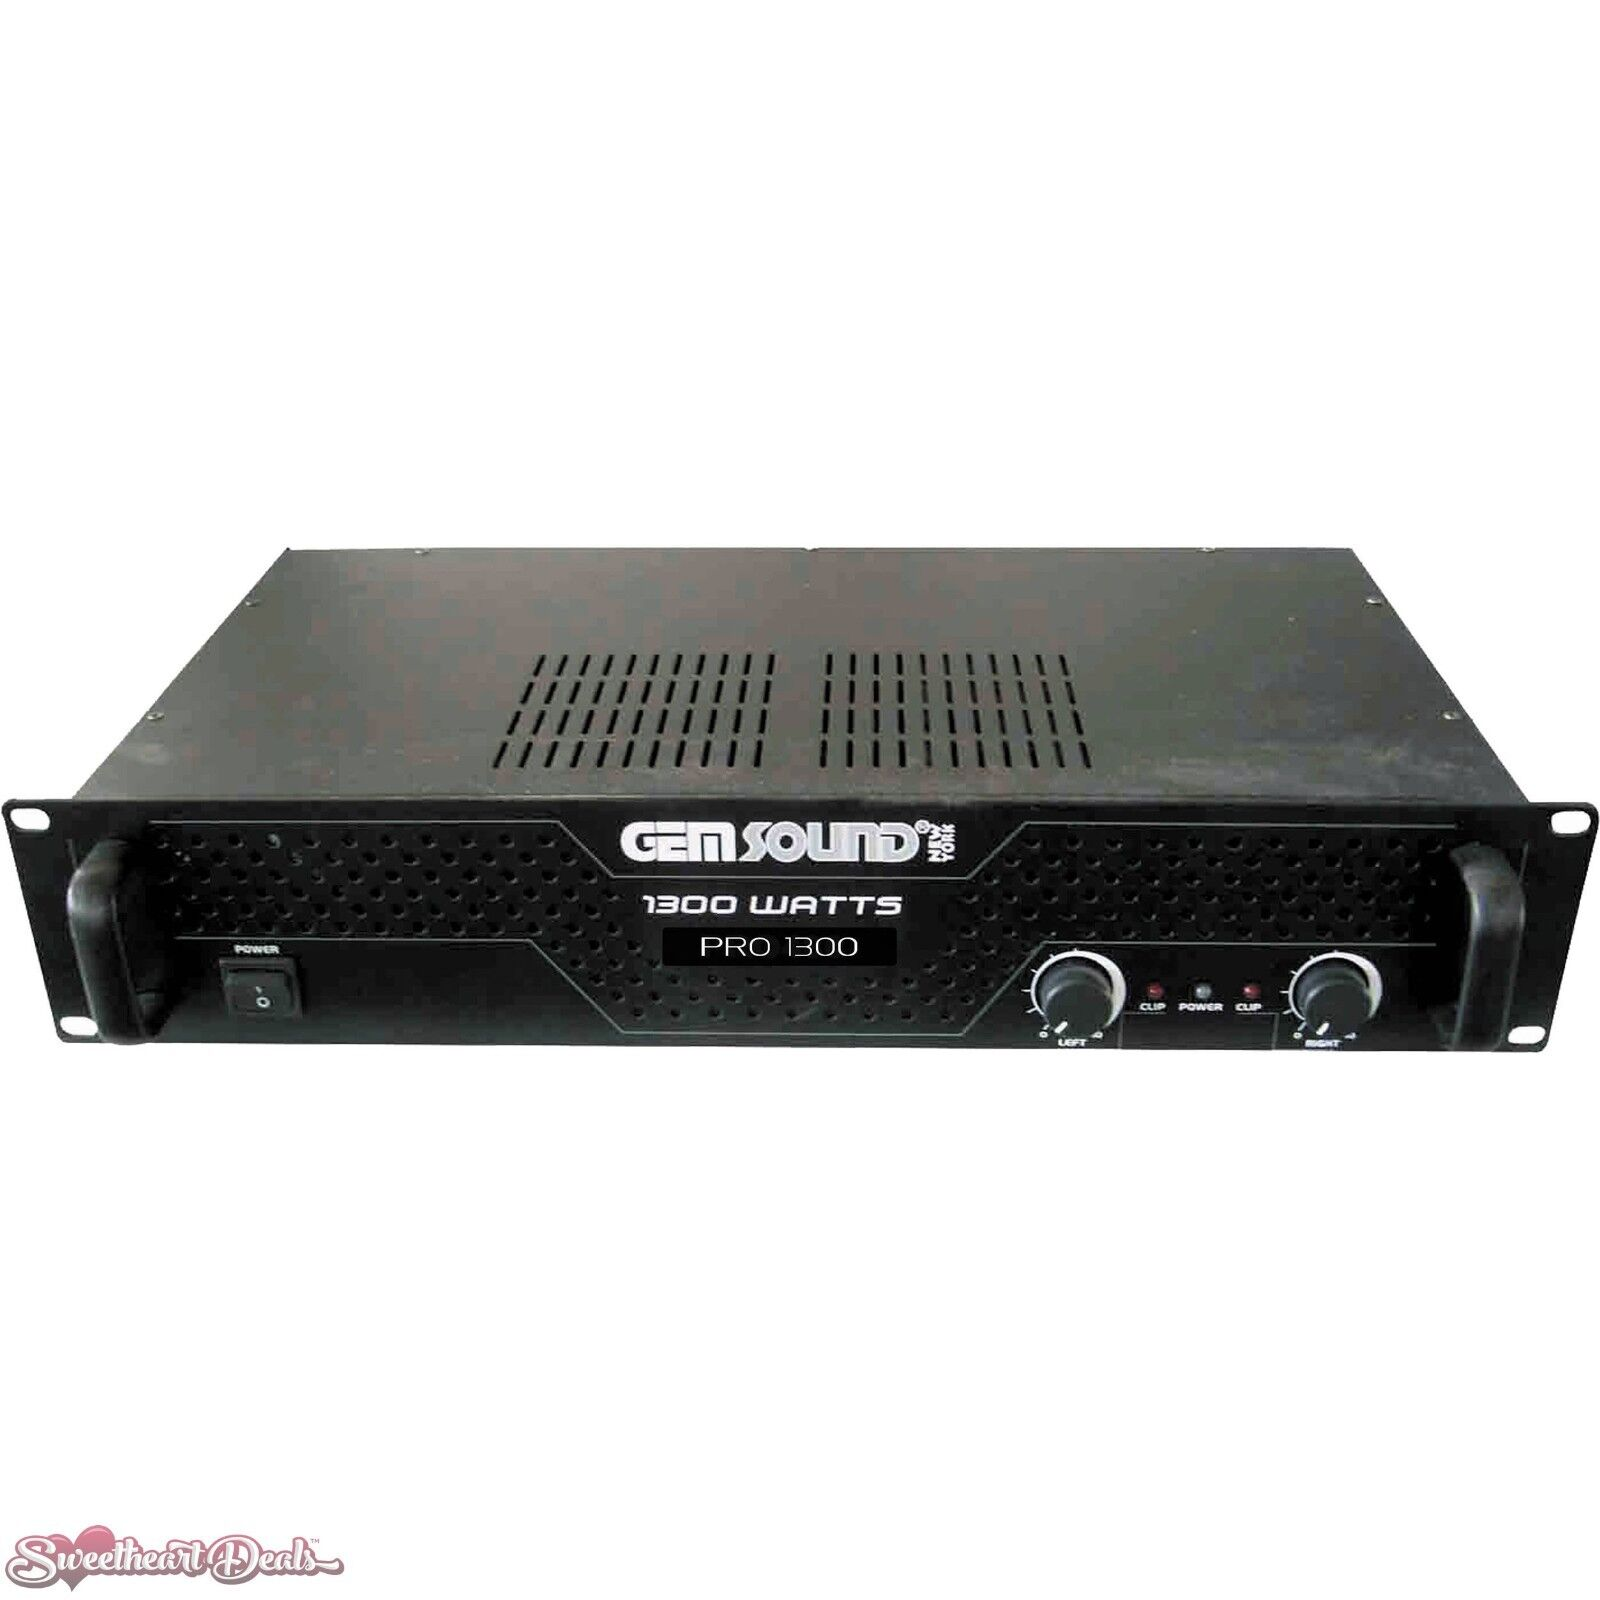 gem sound pro1300 ipp 1300w stereo power amplifier 643595009869 ebaydetails about gem sound pro1300 ipp 1300w stereo power amplifier